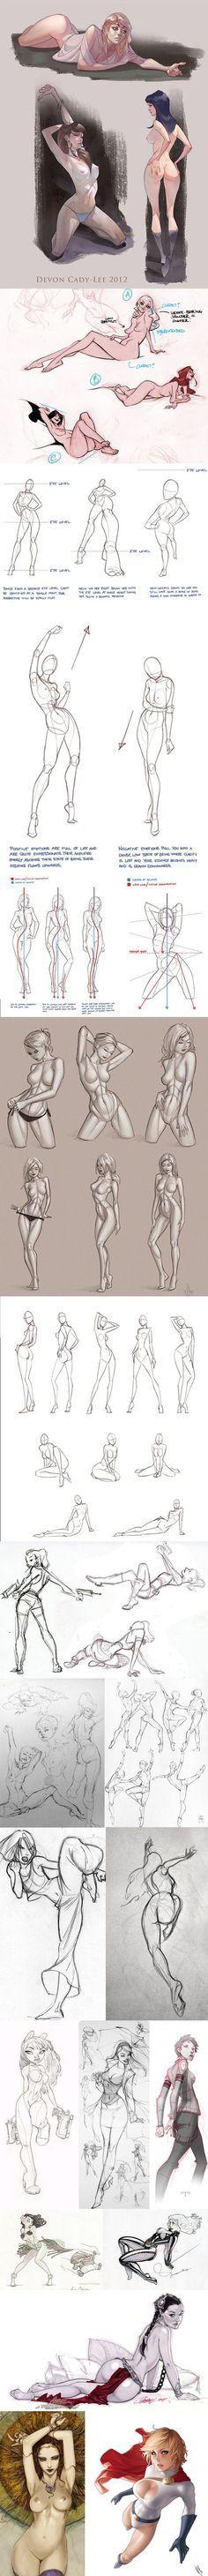 Femmes Nues Female Anatomy Pinterest Drawings Pose And Anatomy